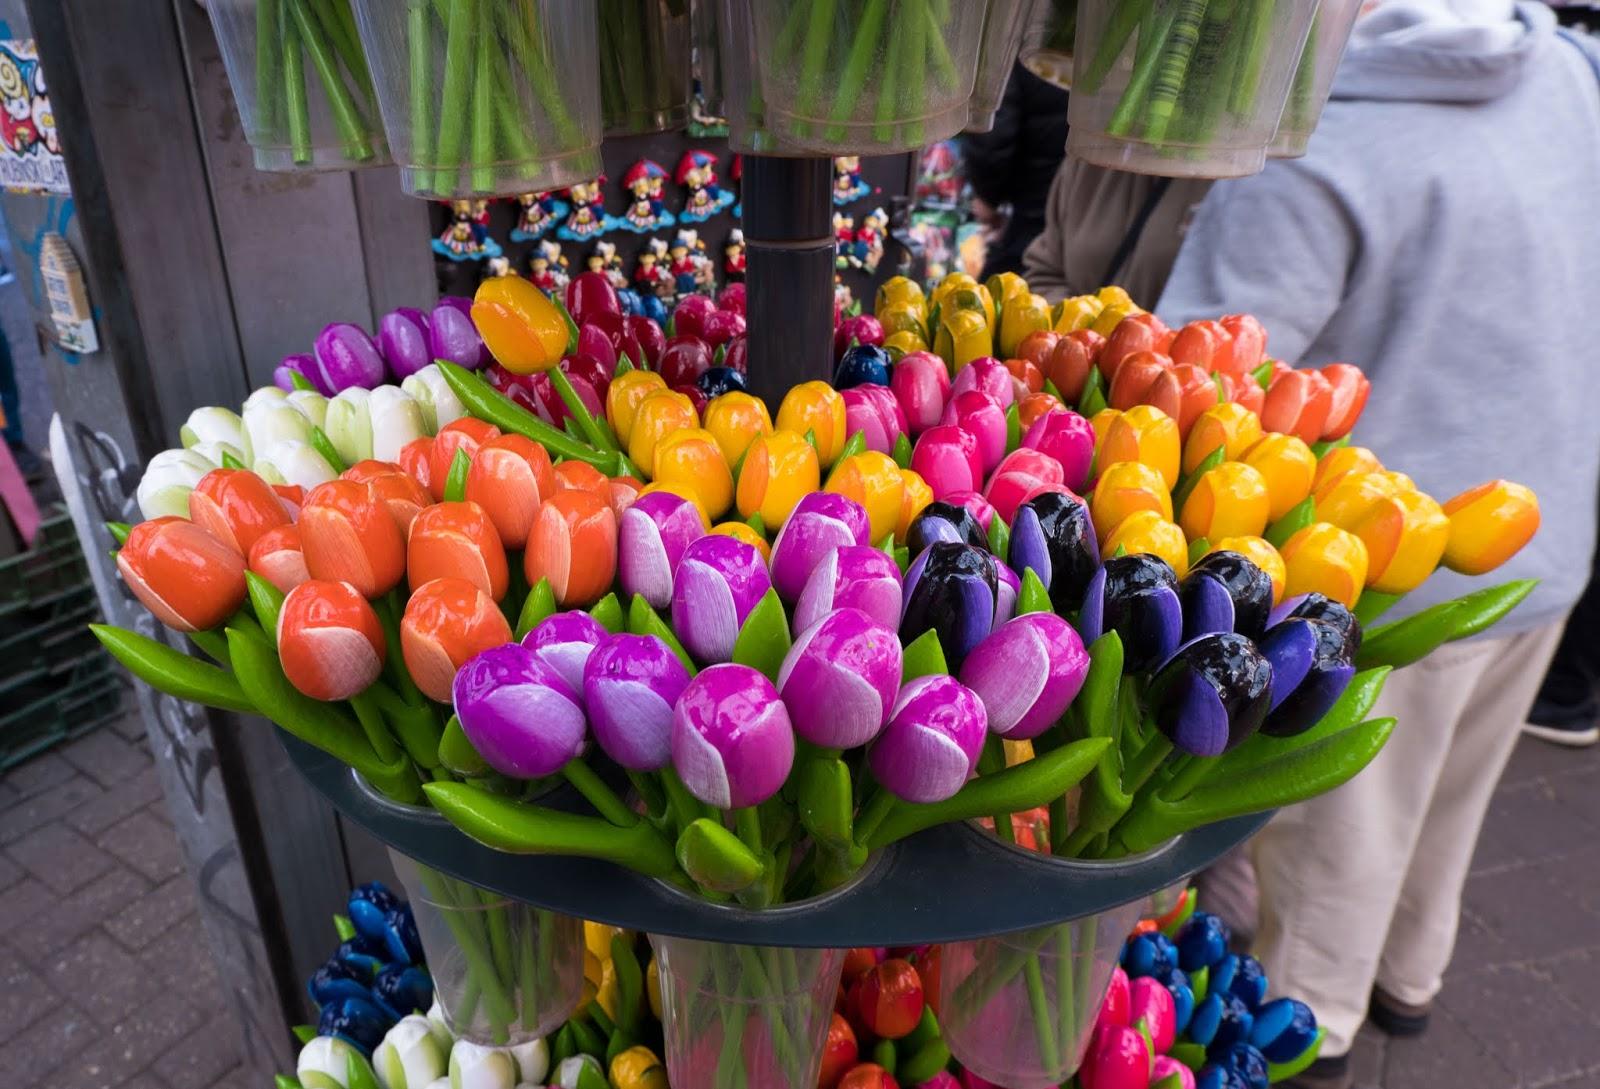 Everlasting tulips at Amsterdam Flower Market